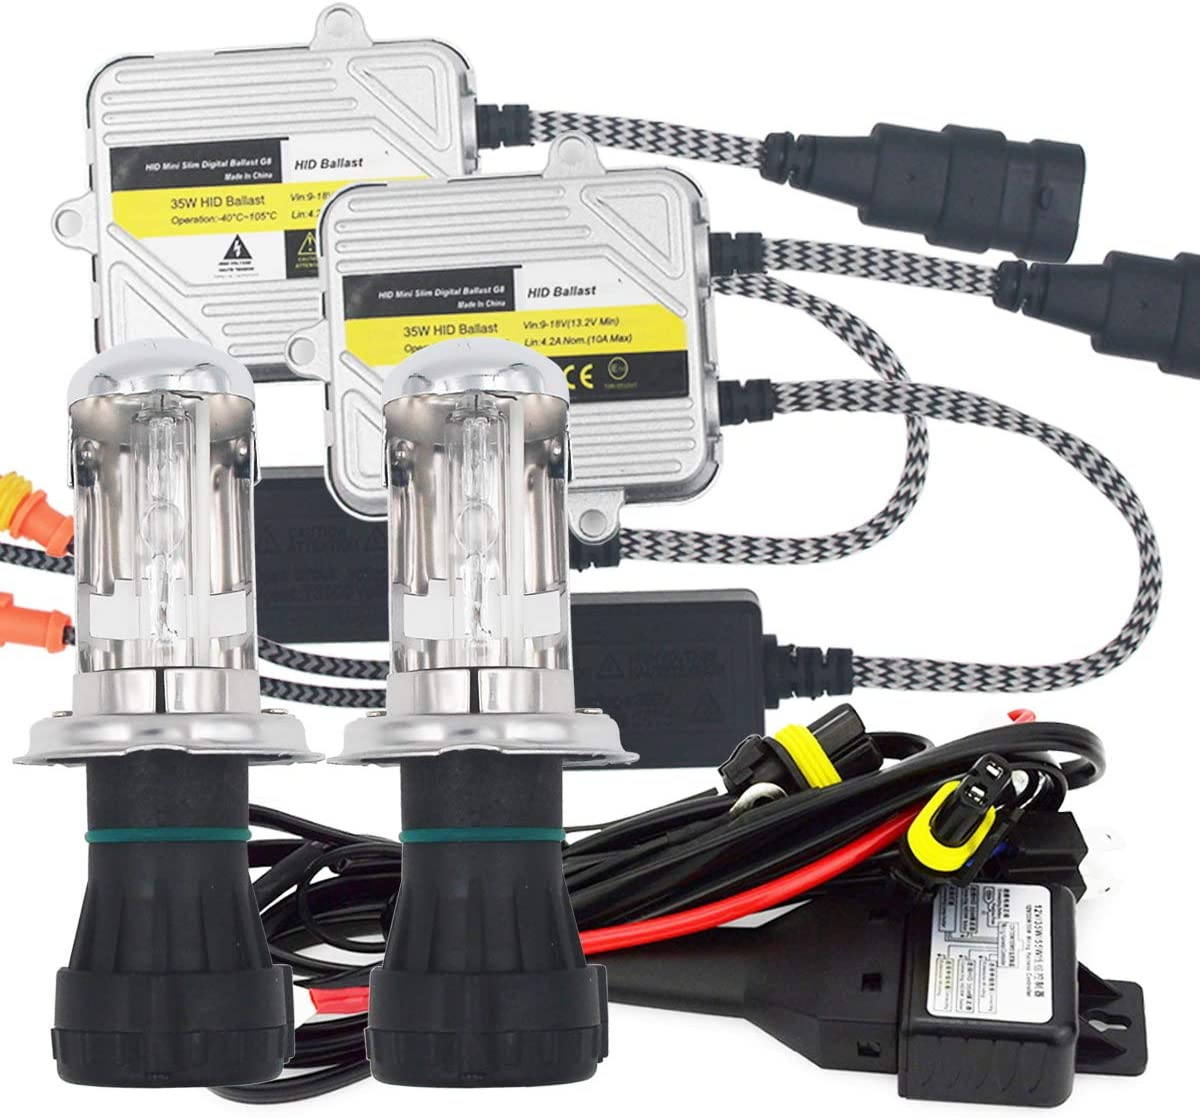 Zantec HID Bi-Xenon Hi//Low Bulb 2pcs 55W H4 HID Bi-Xenon Hi//Low Kit conversione lampadine Faro 3000-12000K Lampadina Ballast 2 6000K 2